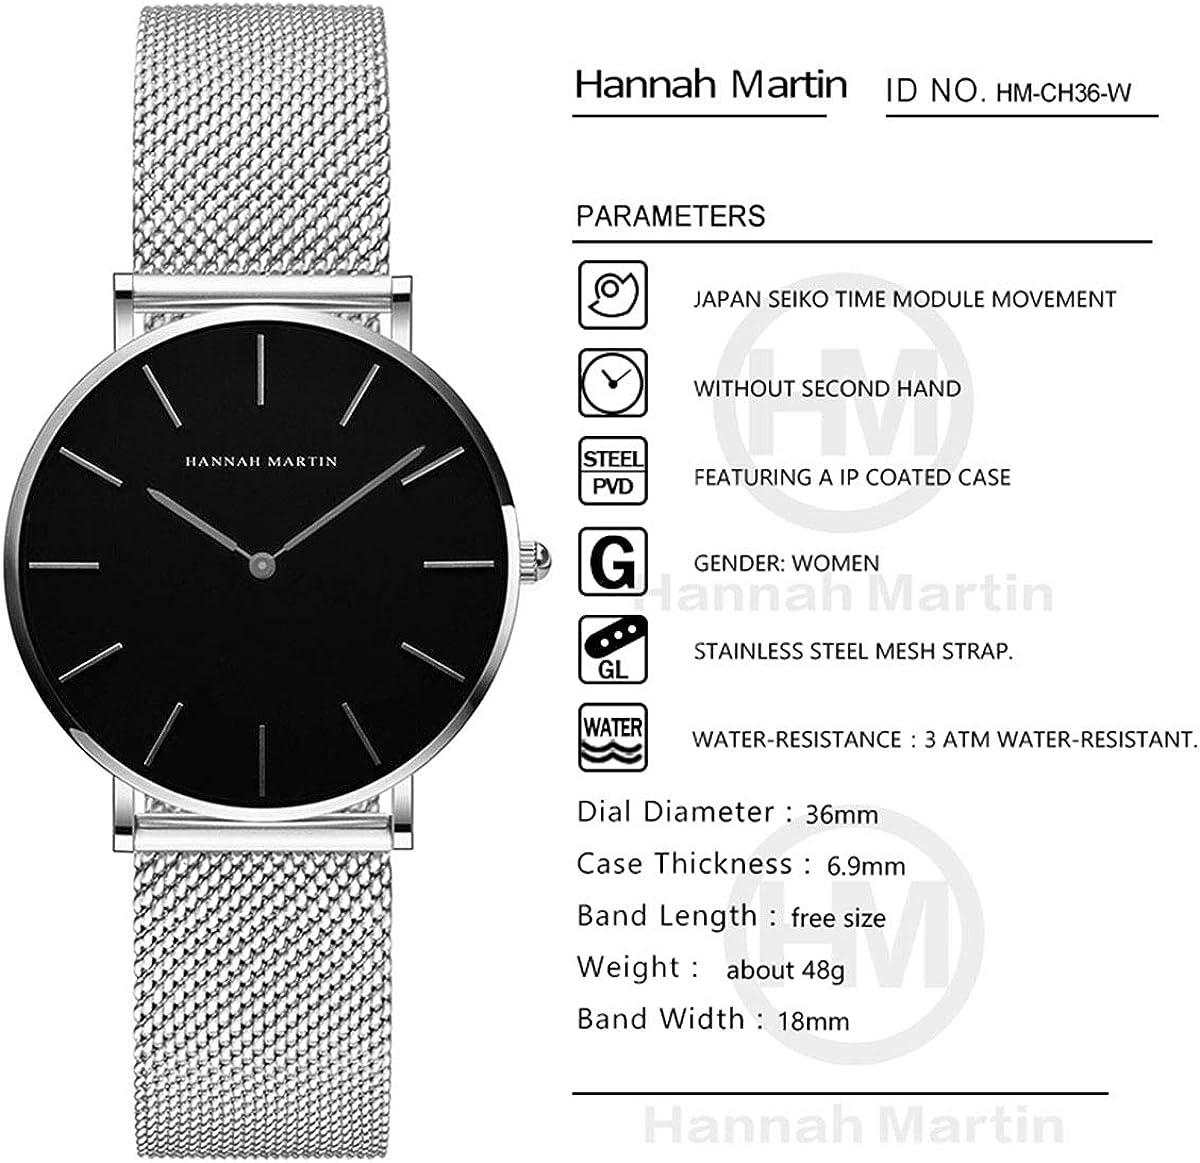 Reloj - HANNAH MARTIN - para - HM-CH36-W: Amazon.es: Relojes